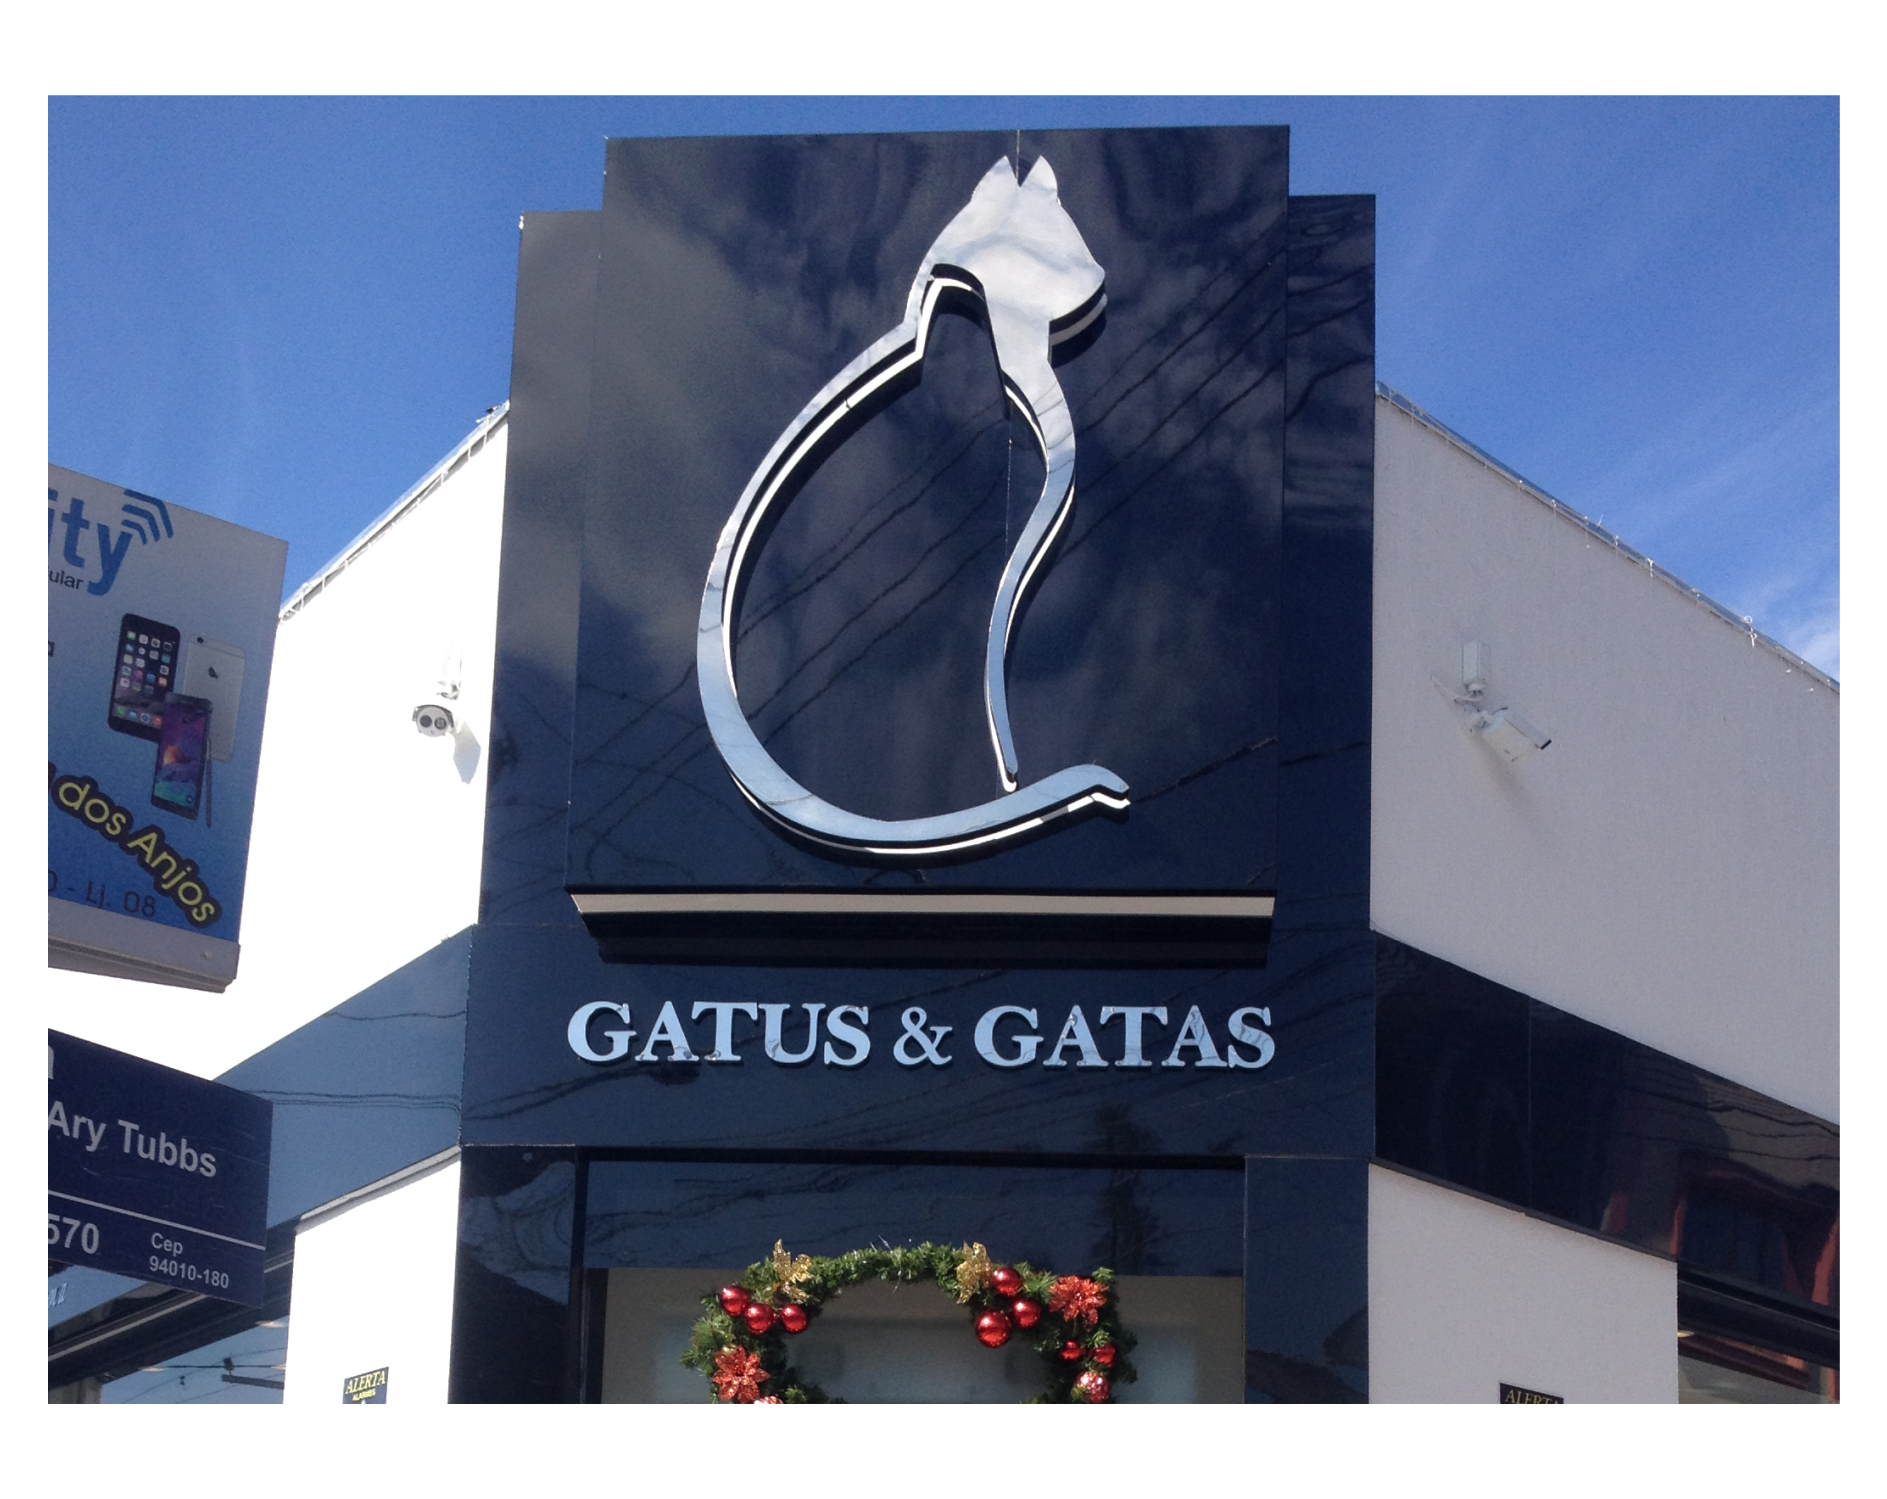 Gatus & Gatas